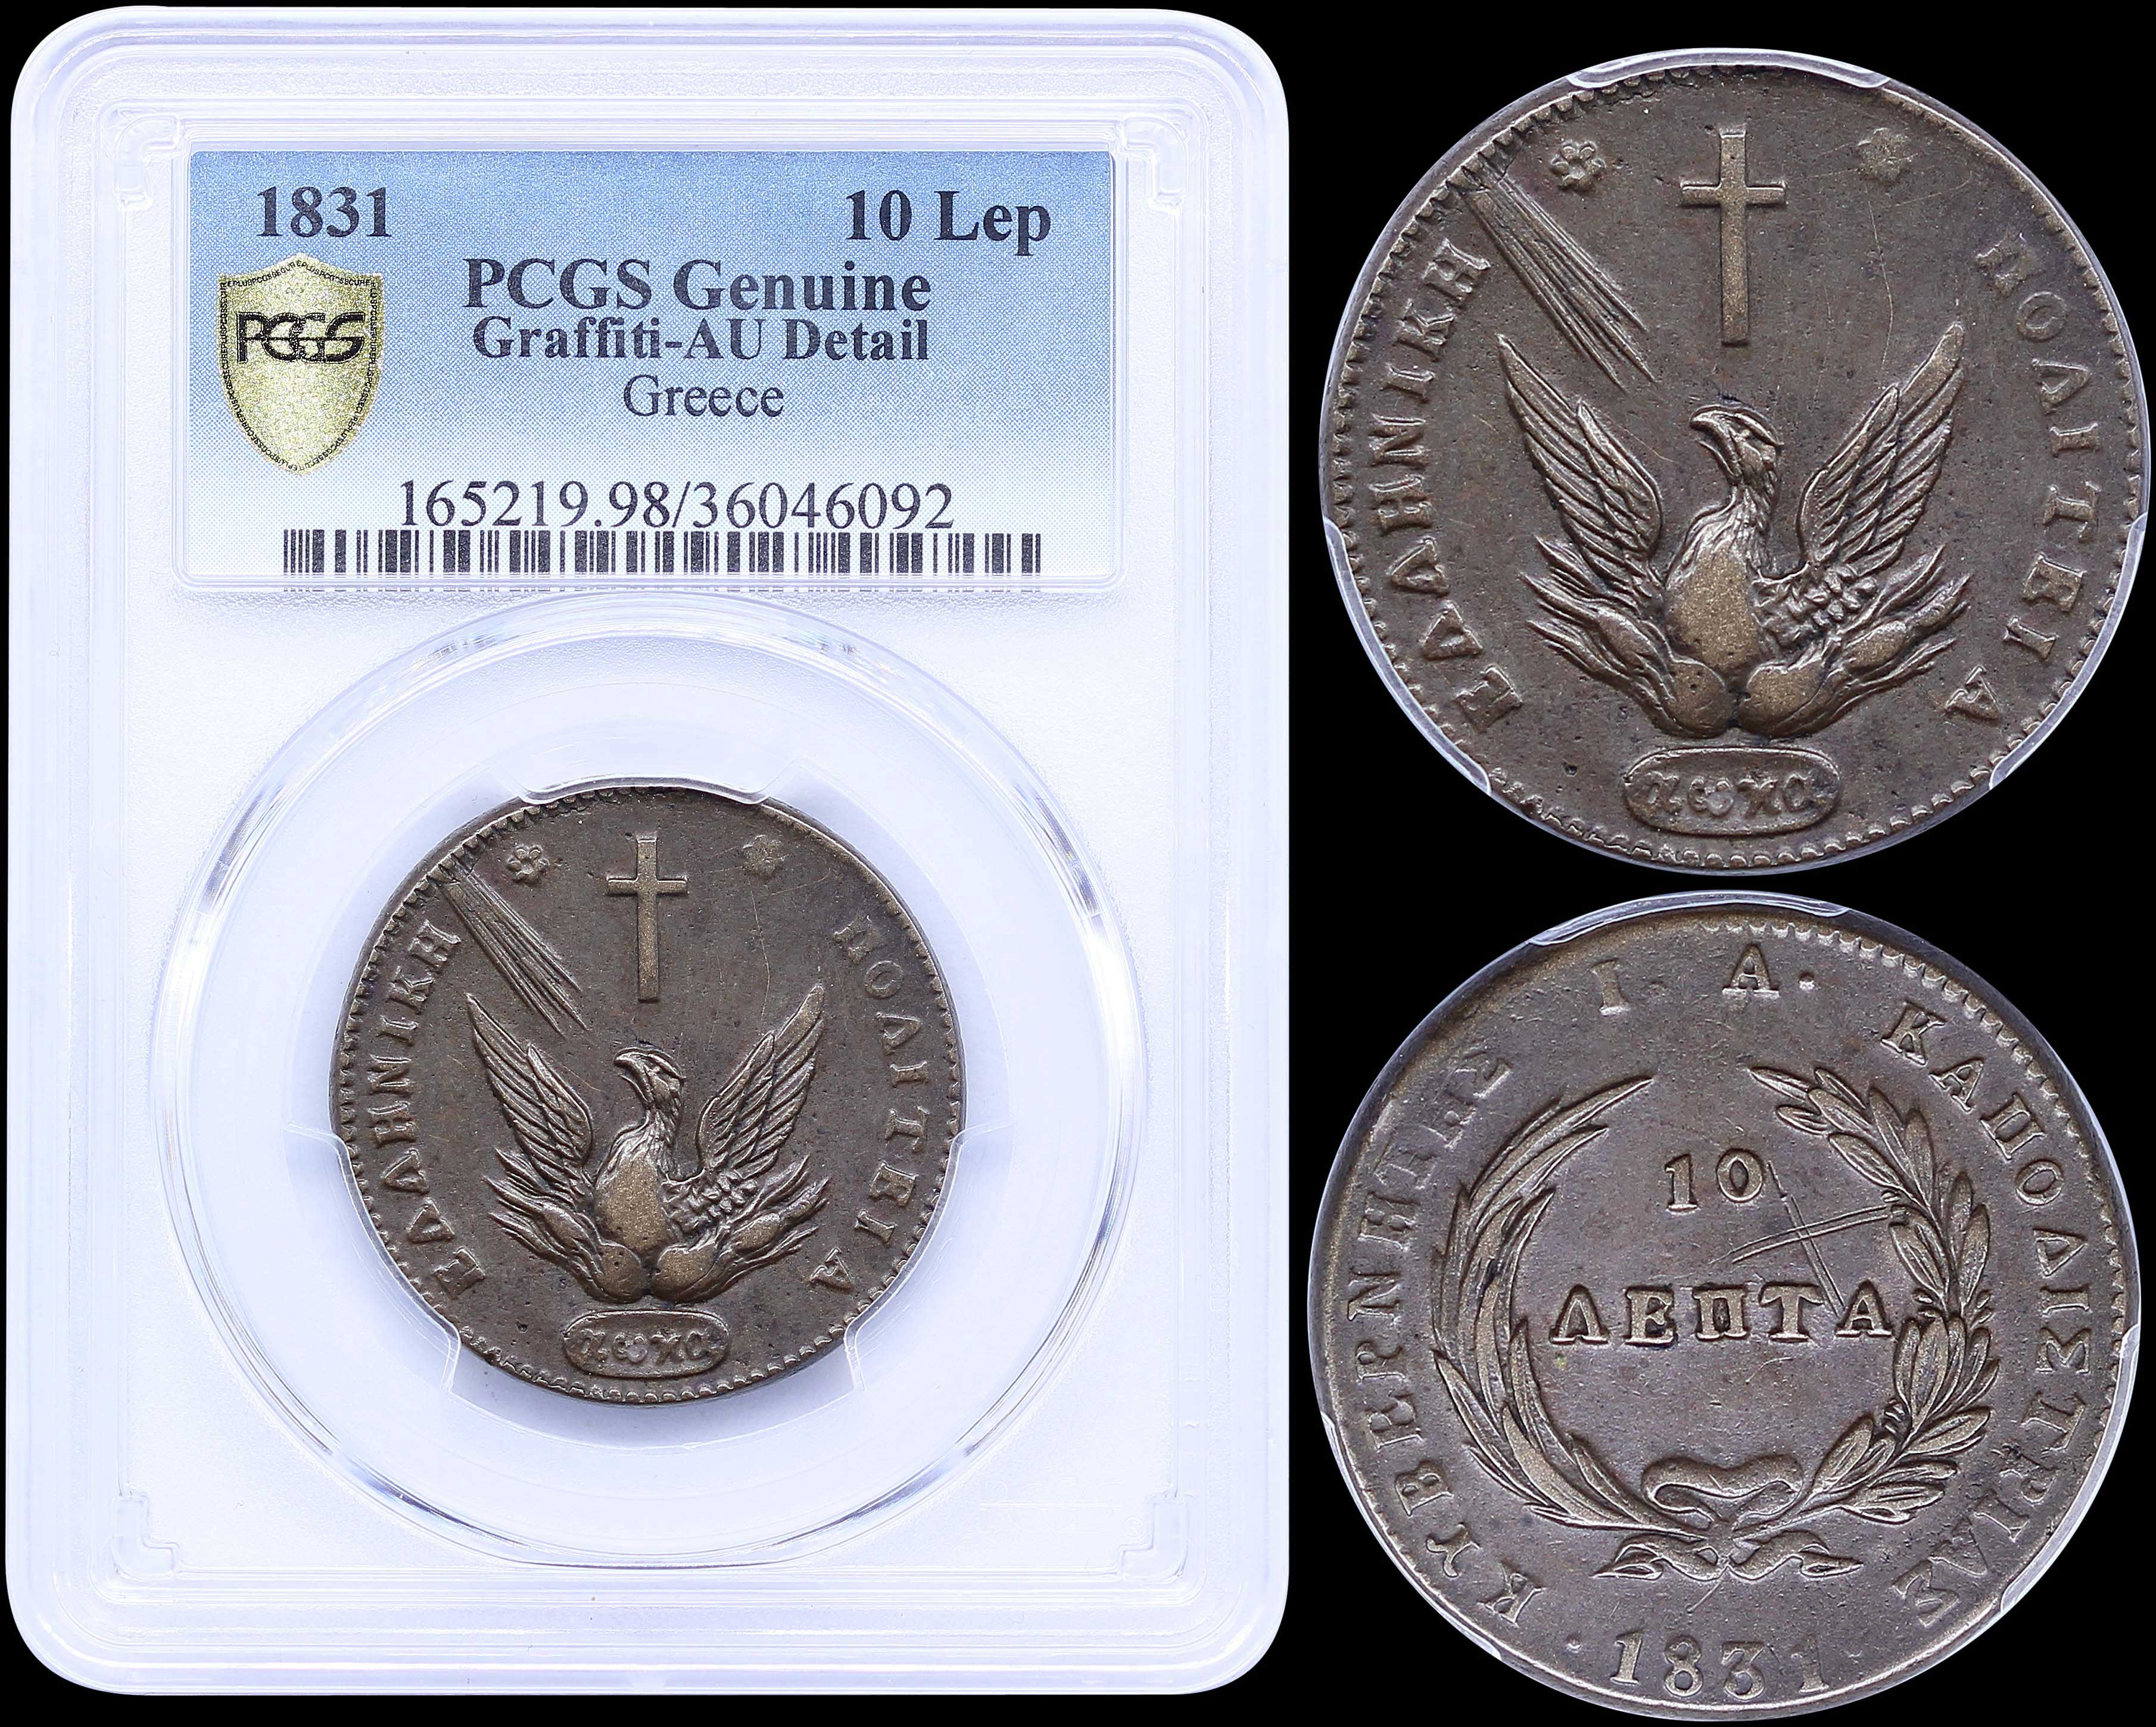 Lot 8052 - -  COINS & TOKENS governor capodistrias -  A. Karamitsos Public & Live Bid Auction 644 Coins, Medals & Banknotes